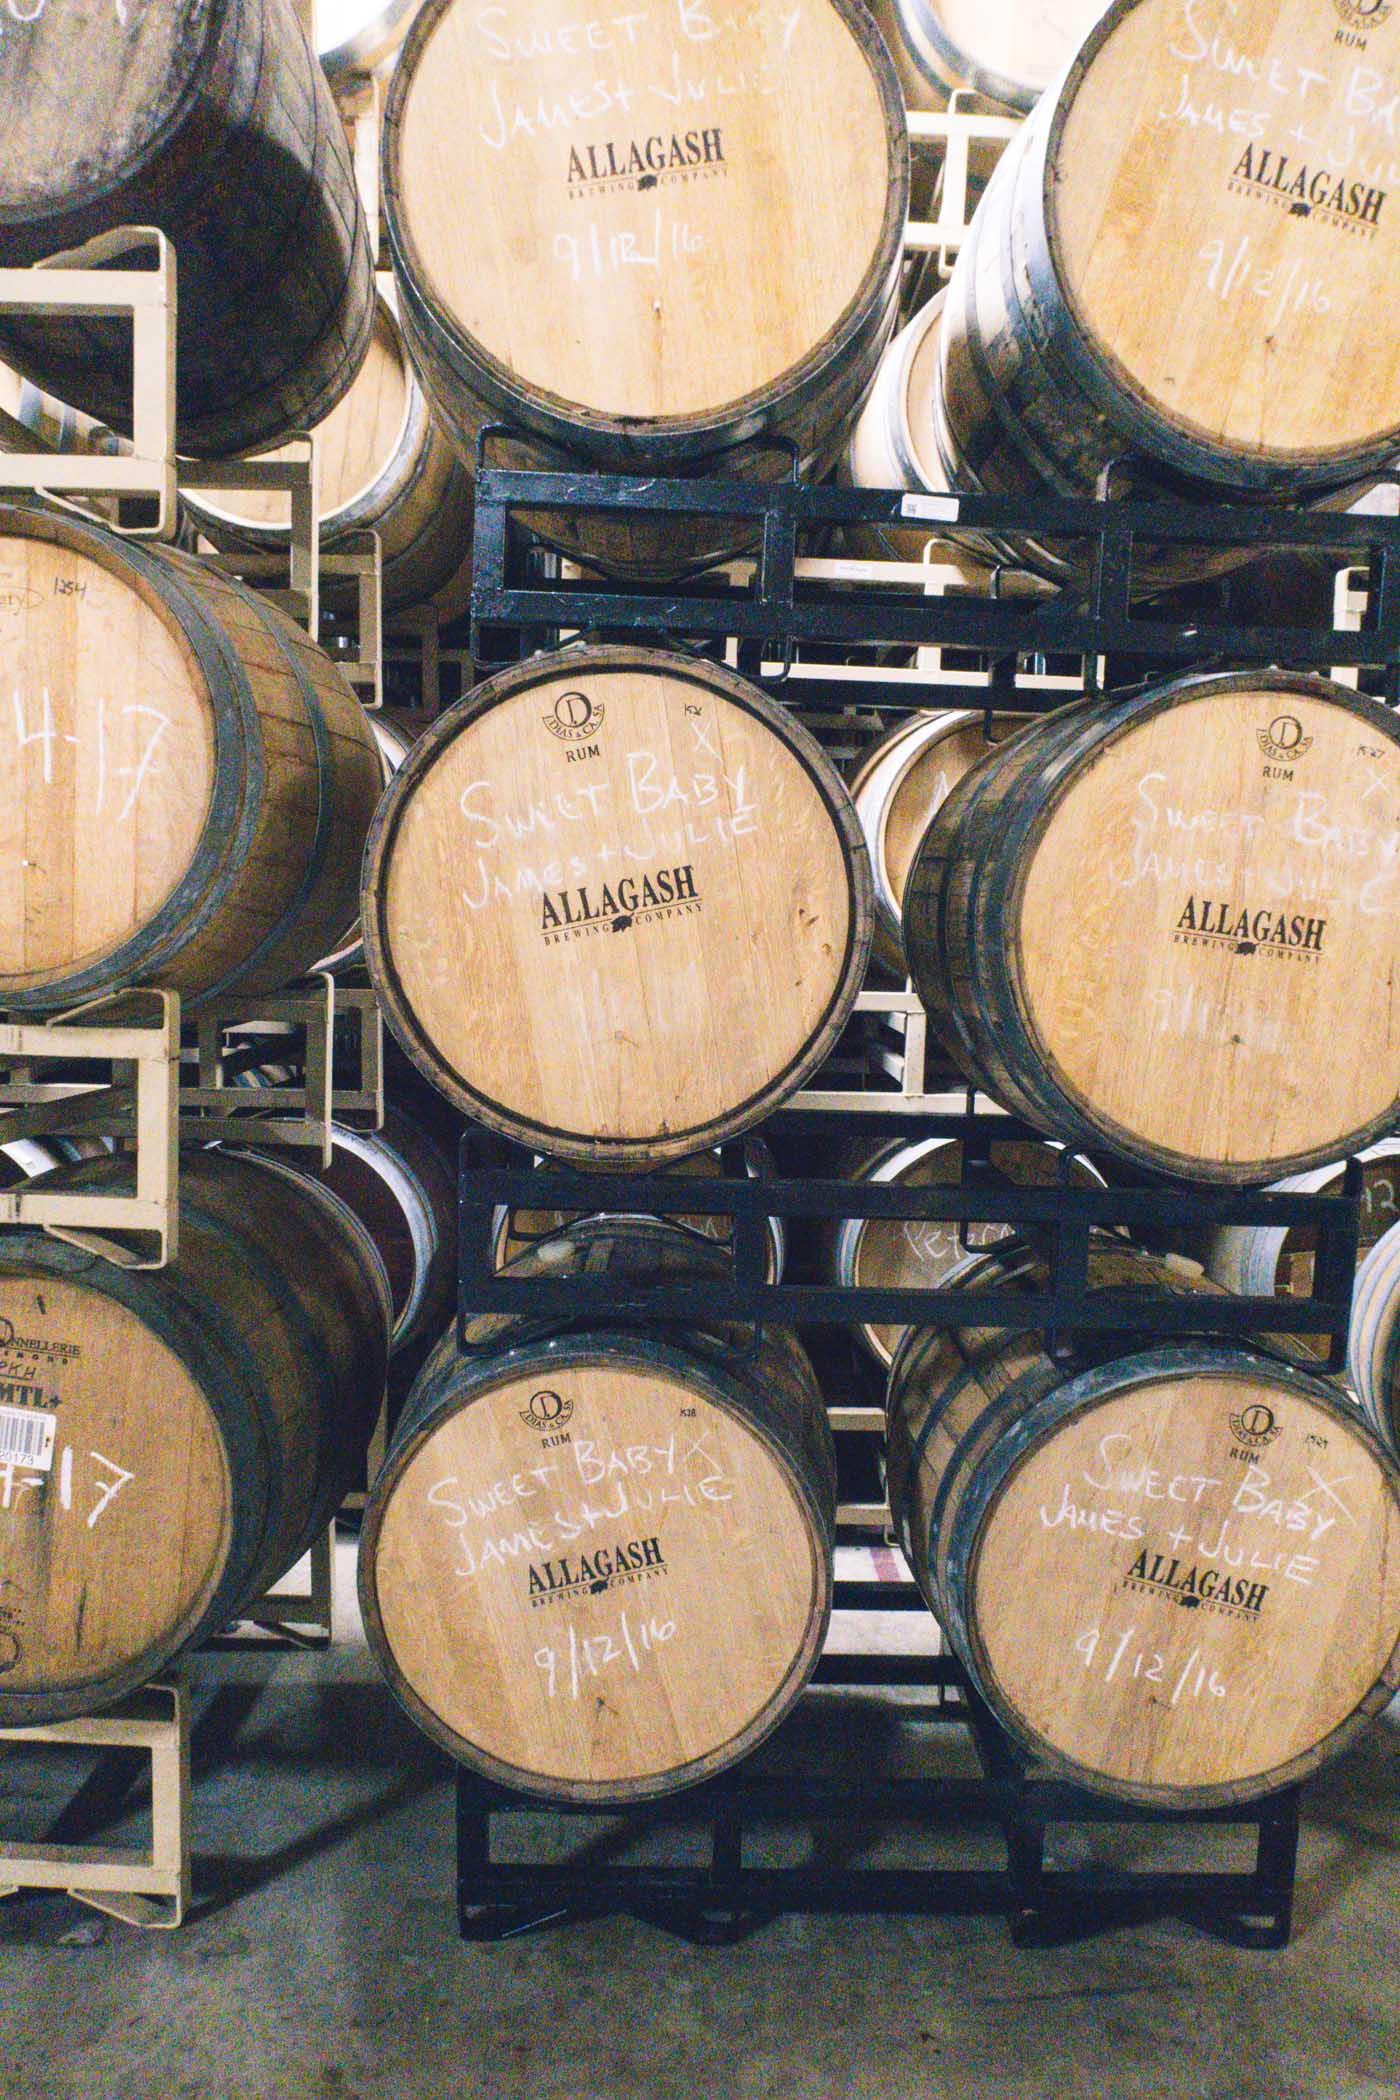 Beer Barrels at Allagash Brewing Co., Portland, Maine